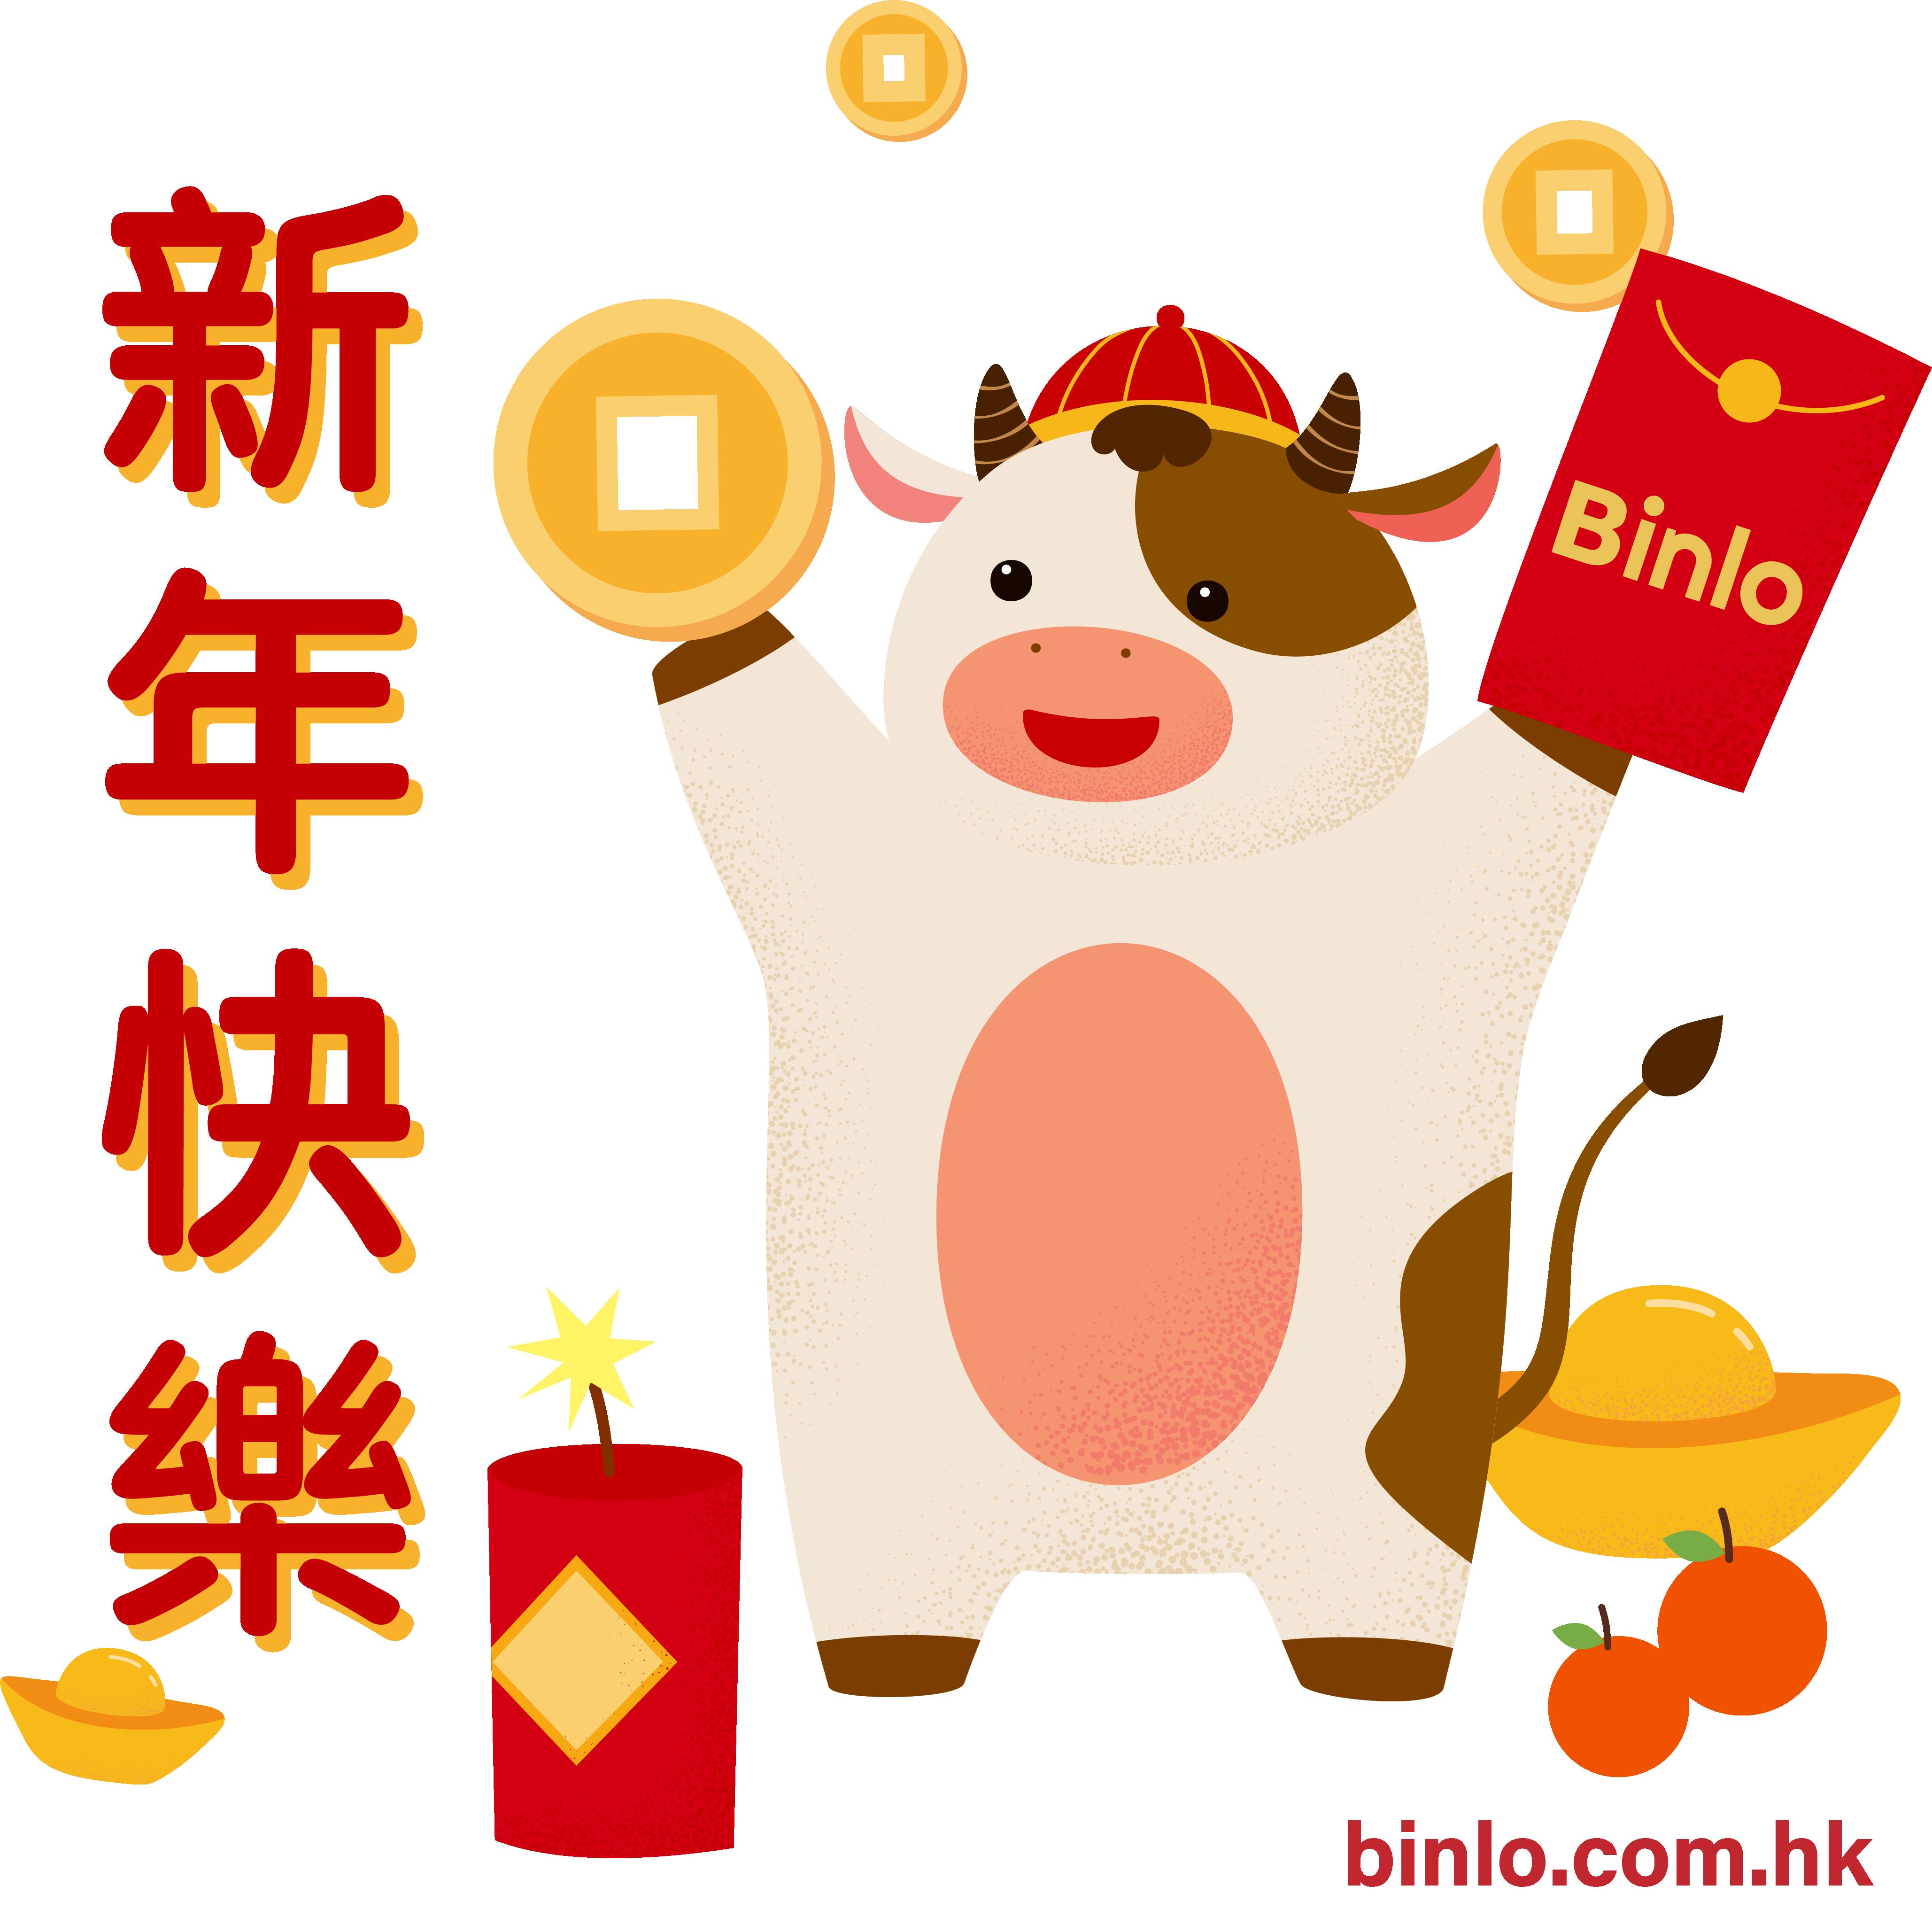 Binlo 祝您新年快樂!牛氣沖天!